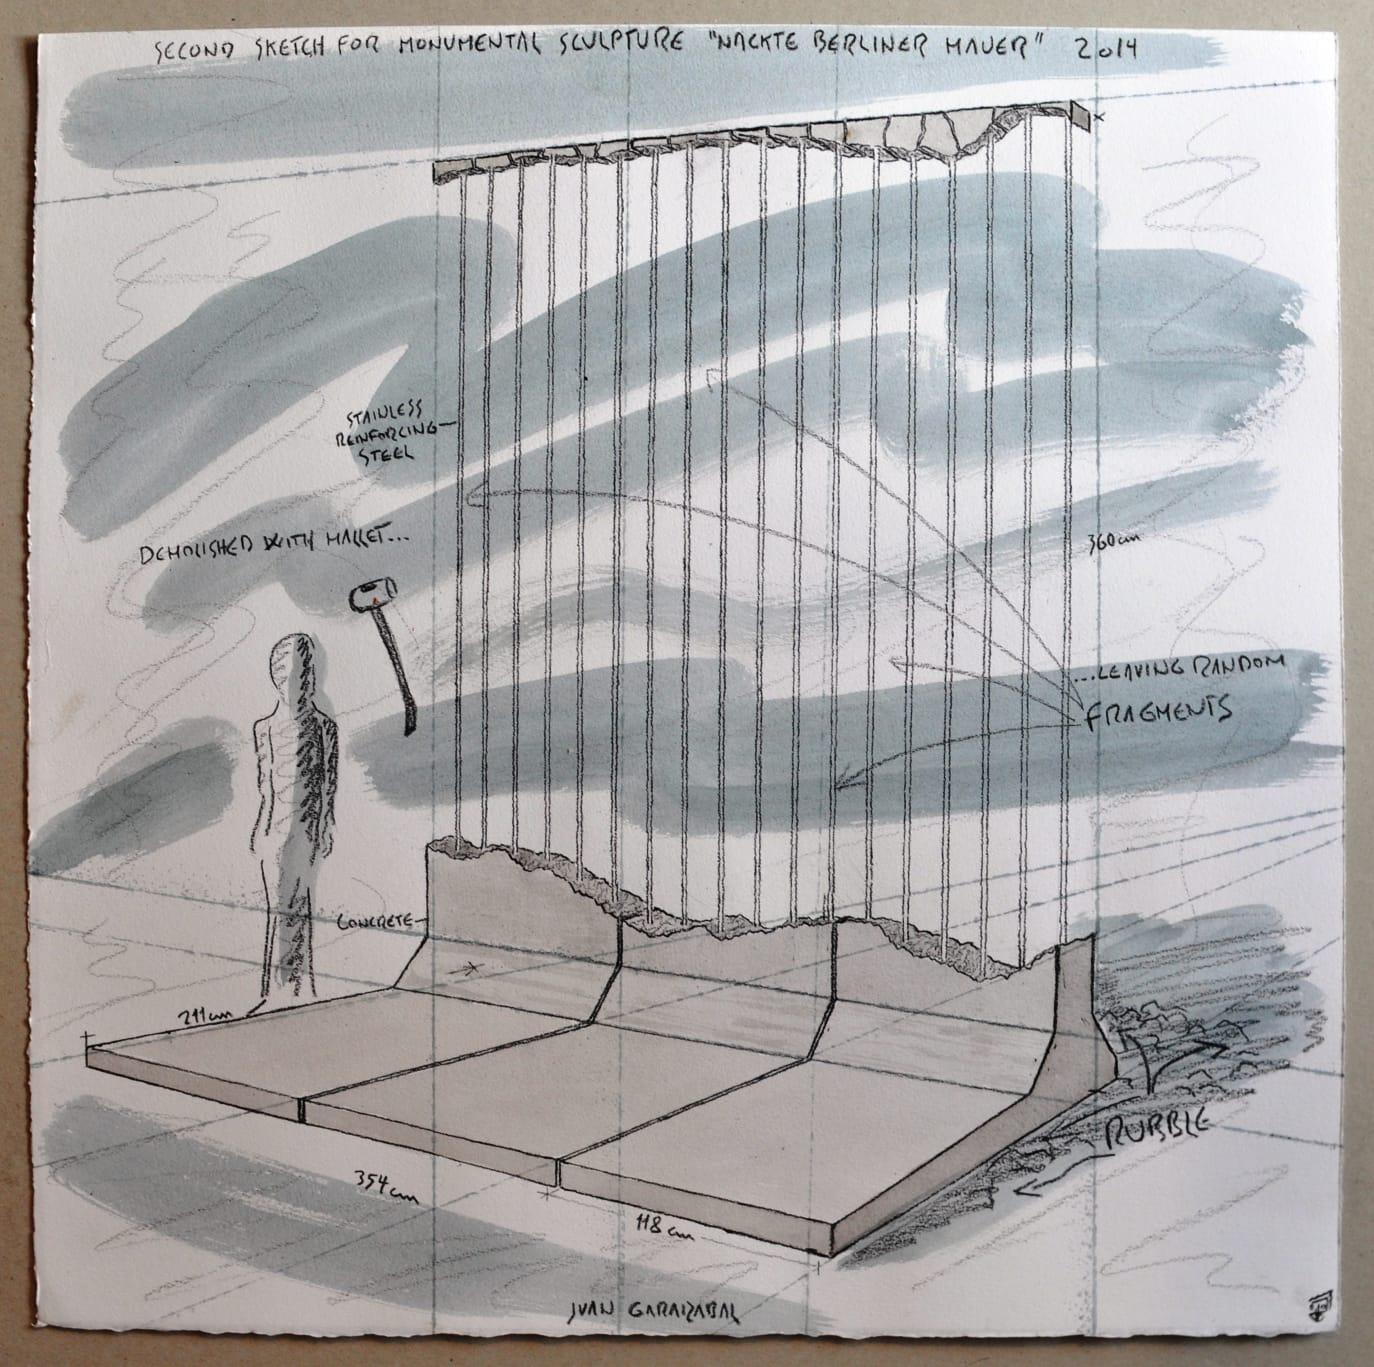 muro-de-berlin-juan-garaizabal-boceto